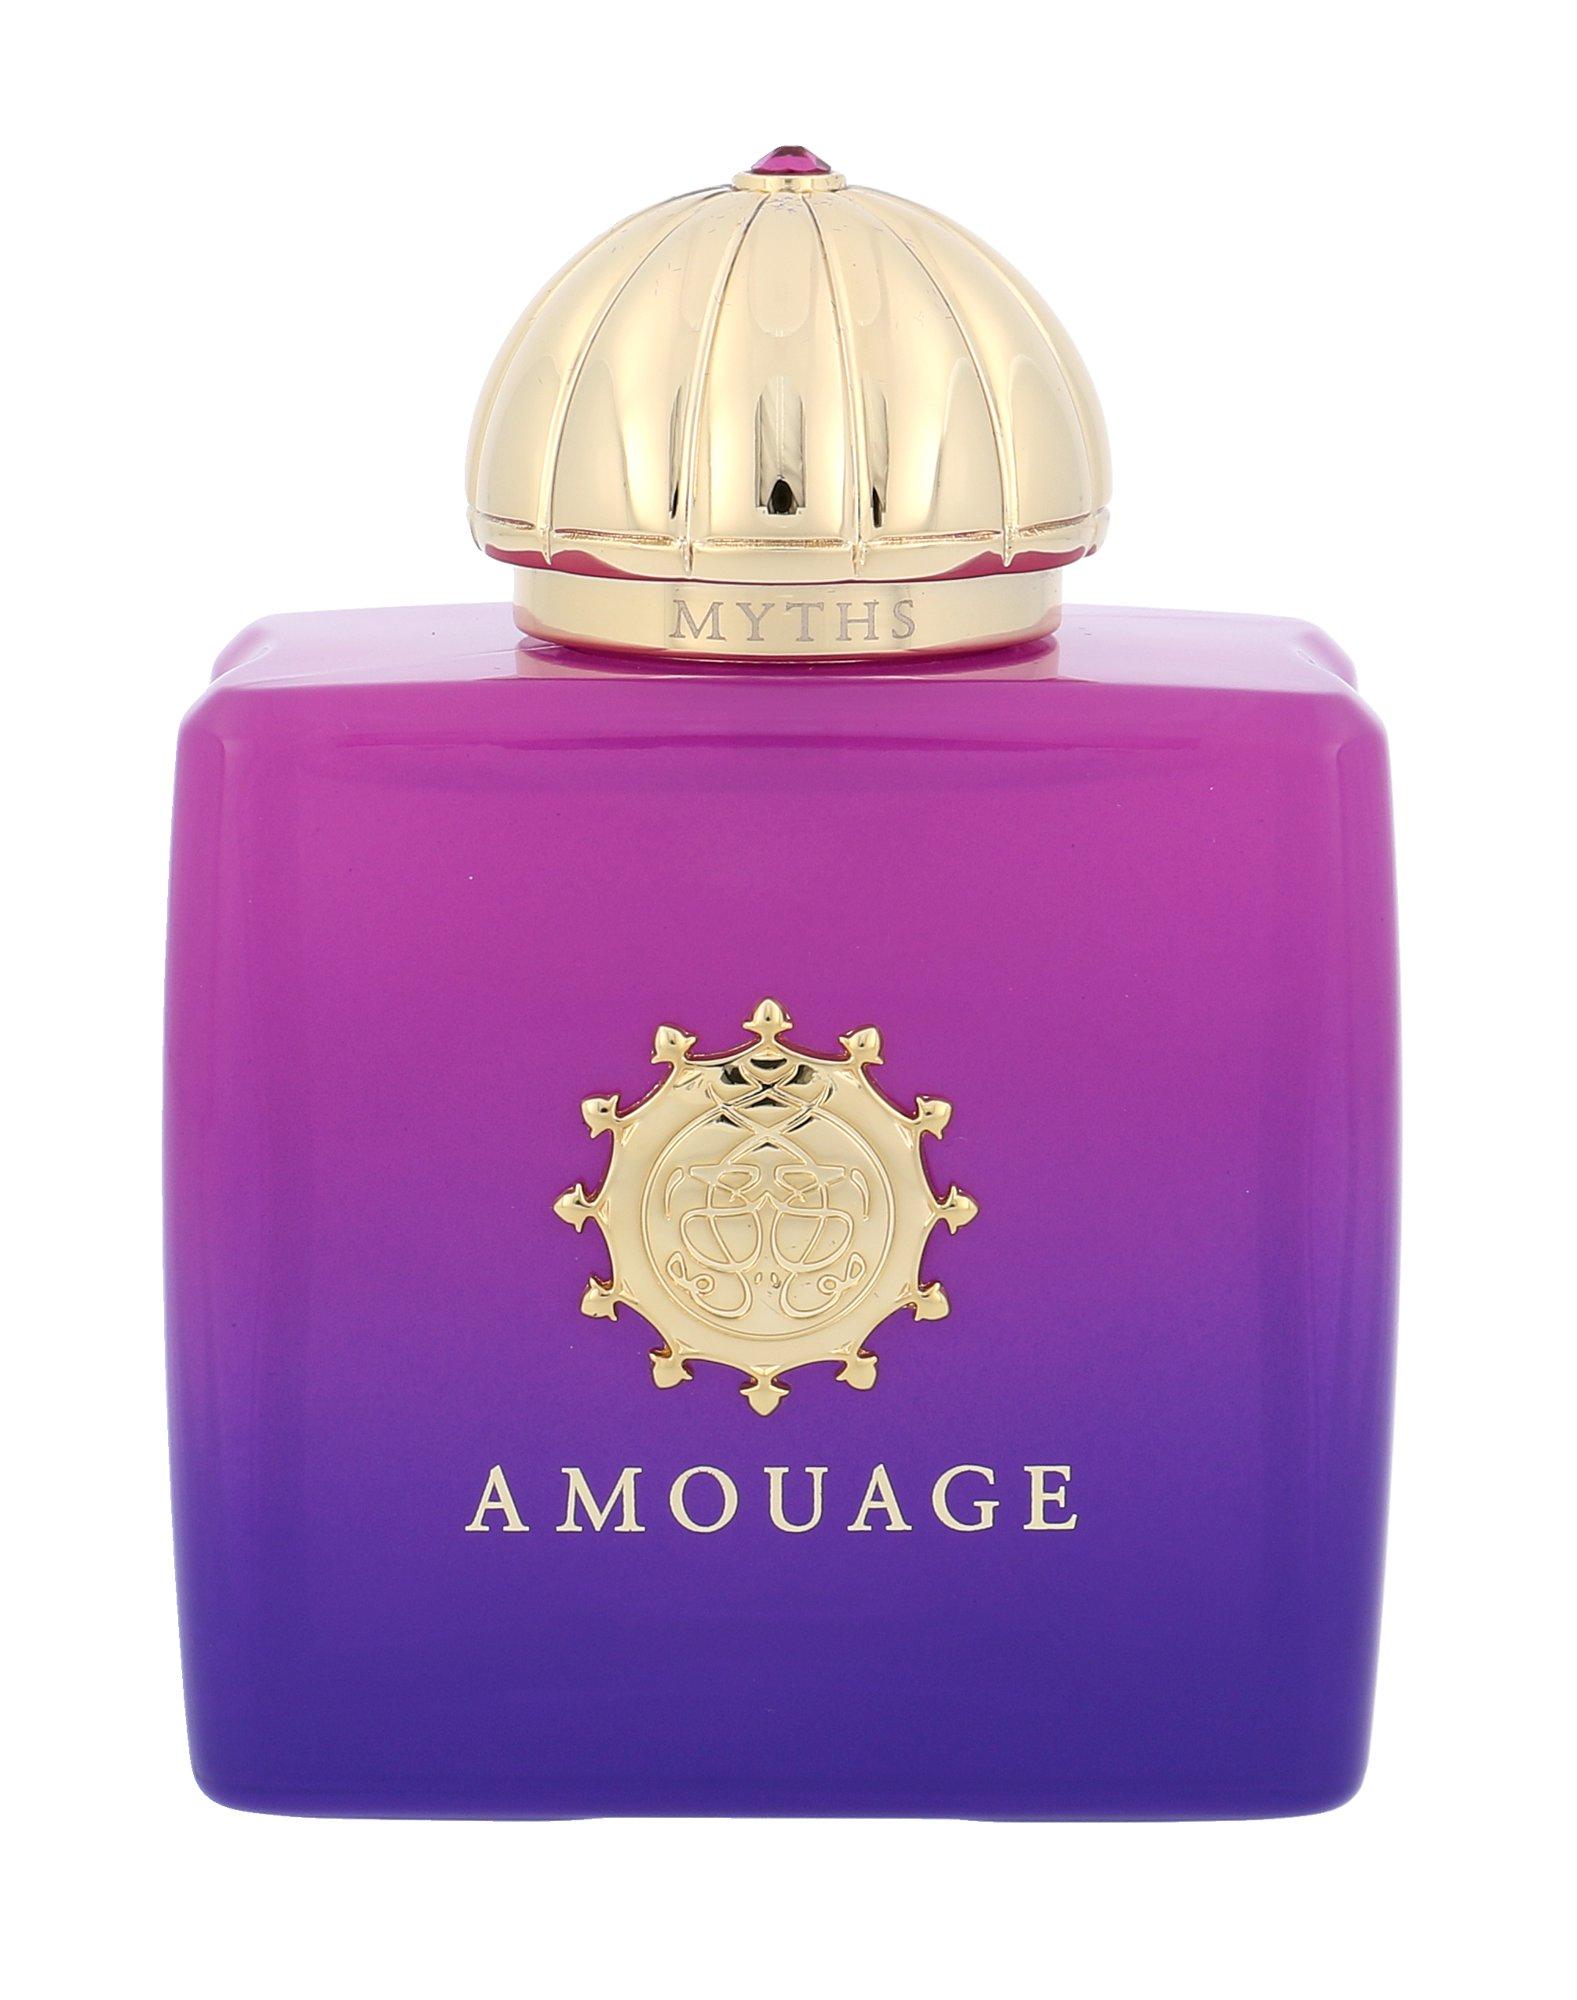 Amouage Myths Woman, edp 100ml